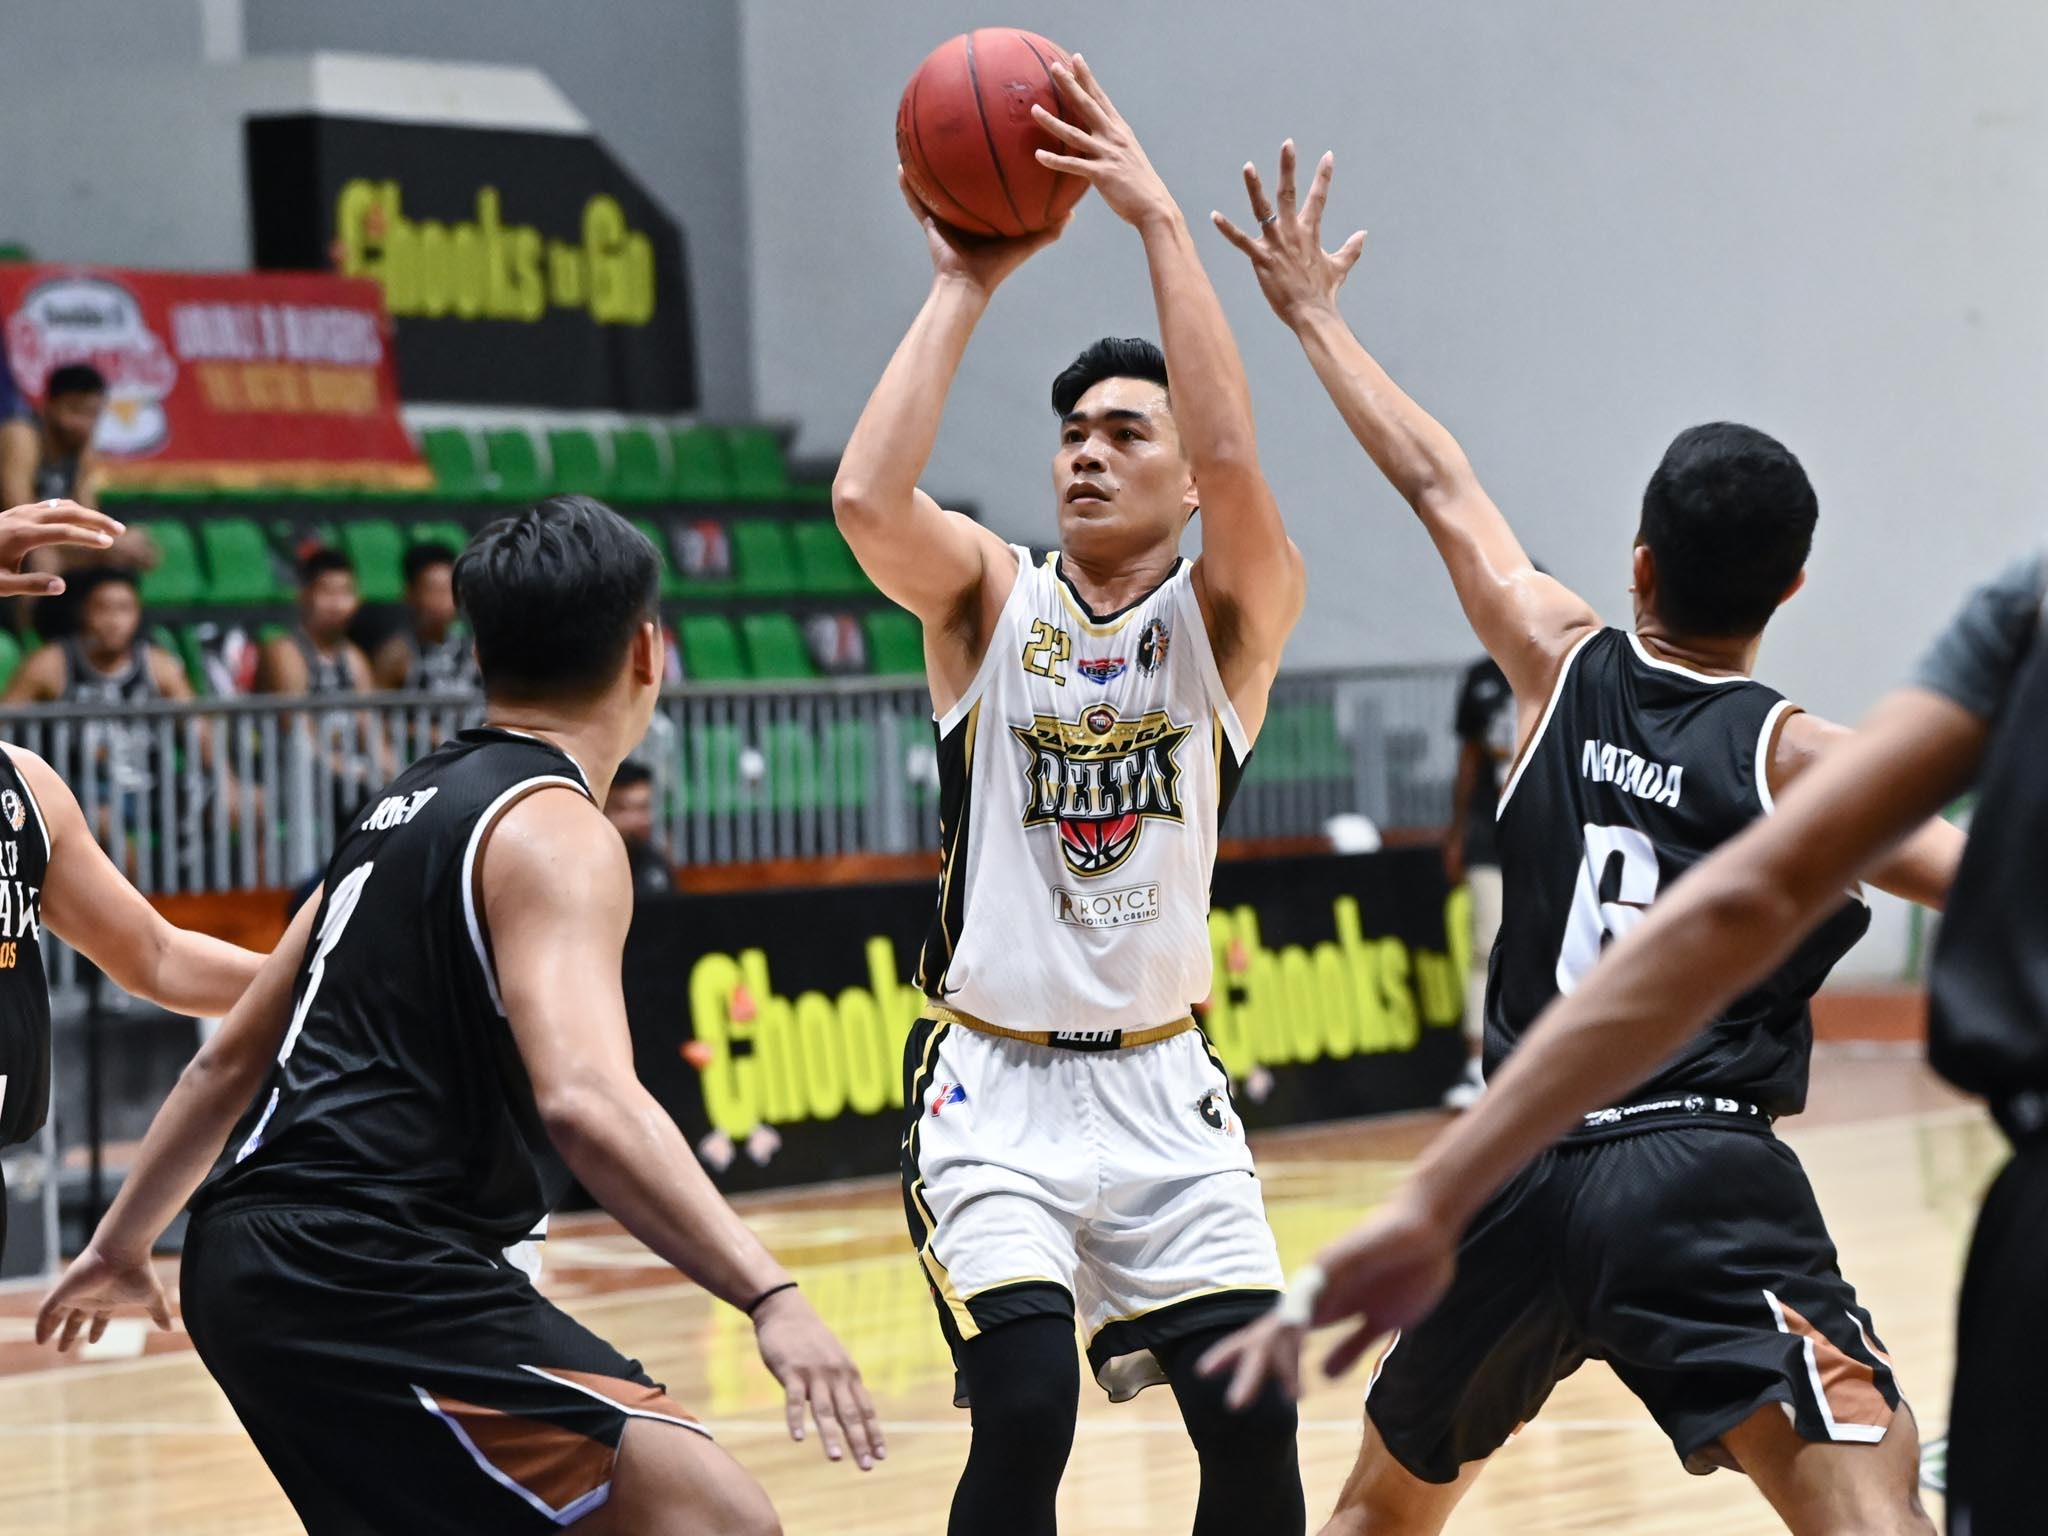 2021-Chooks-NBL-Pampanga-vs-Mindoro-LEVI-HERNANDEZ Serrano shines as Pampanga dehorns Mindoro to open NBL back-to-back bid Basketball NBL News  - philippine sports news